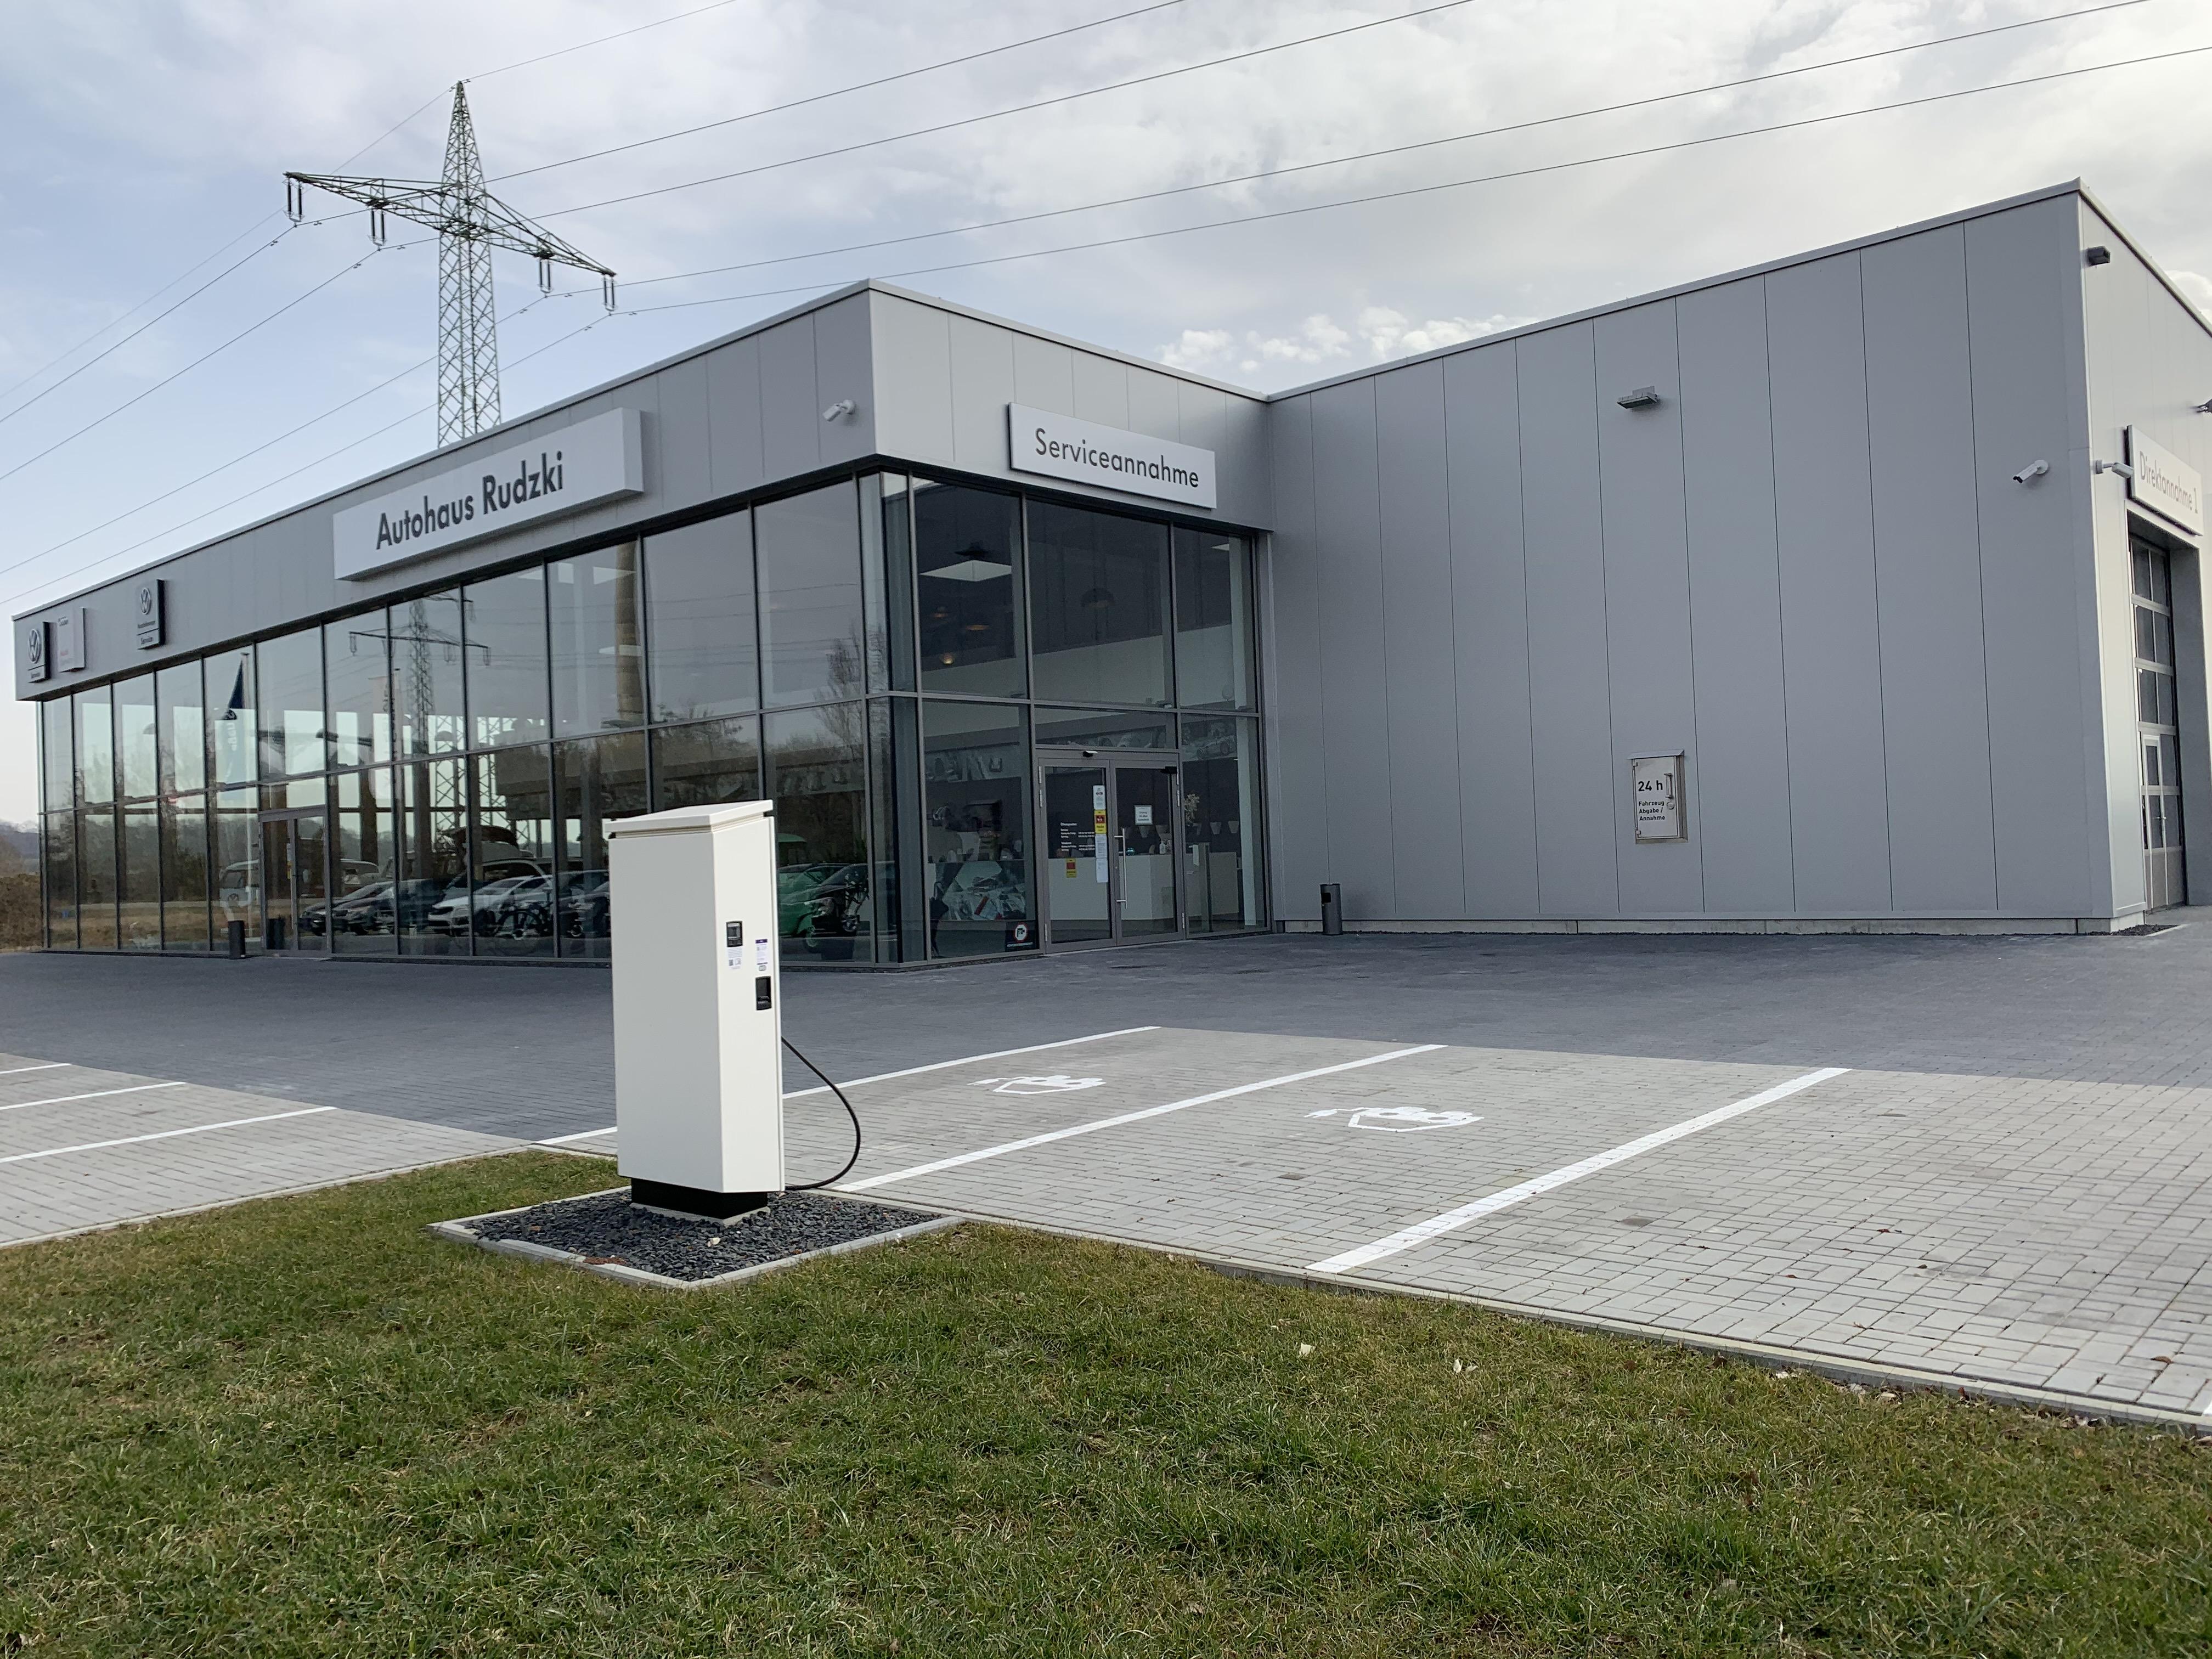 Autohaus Rudzki